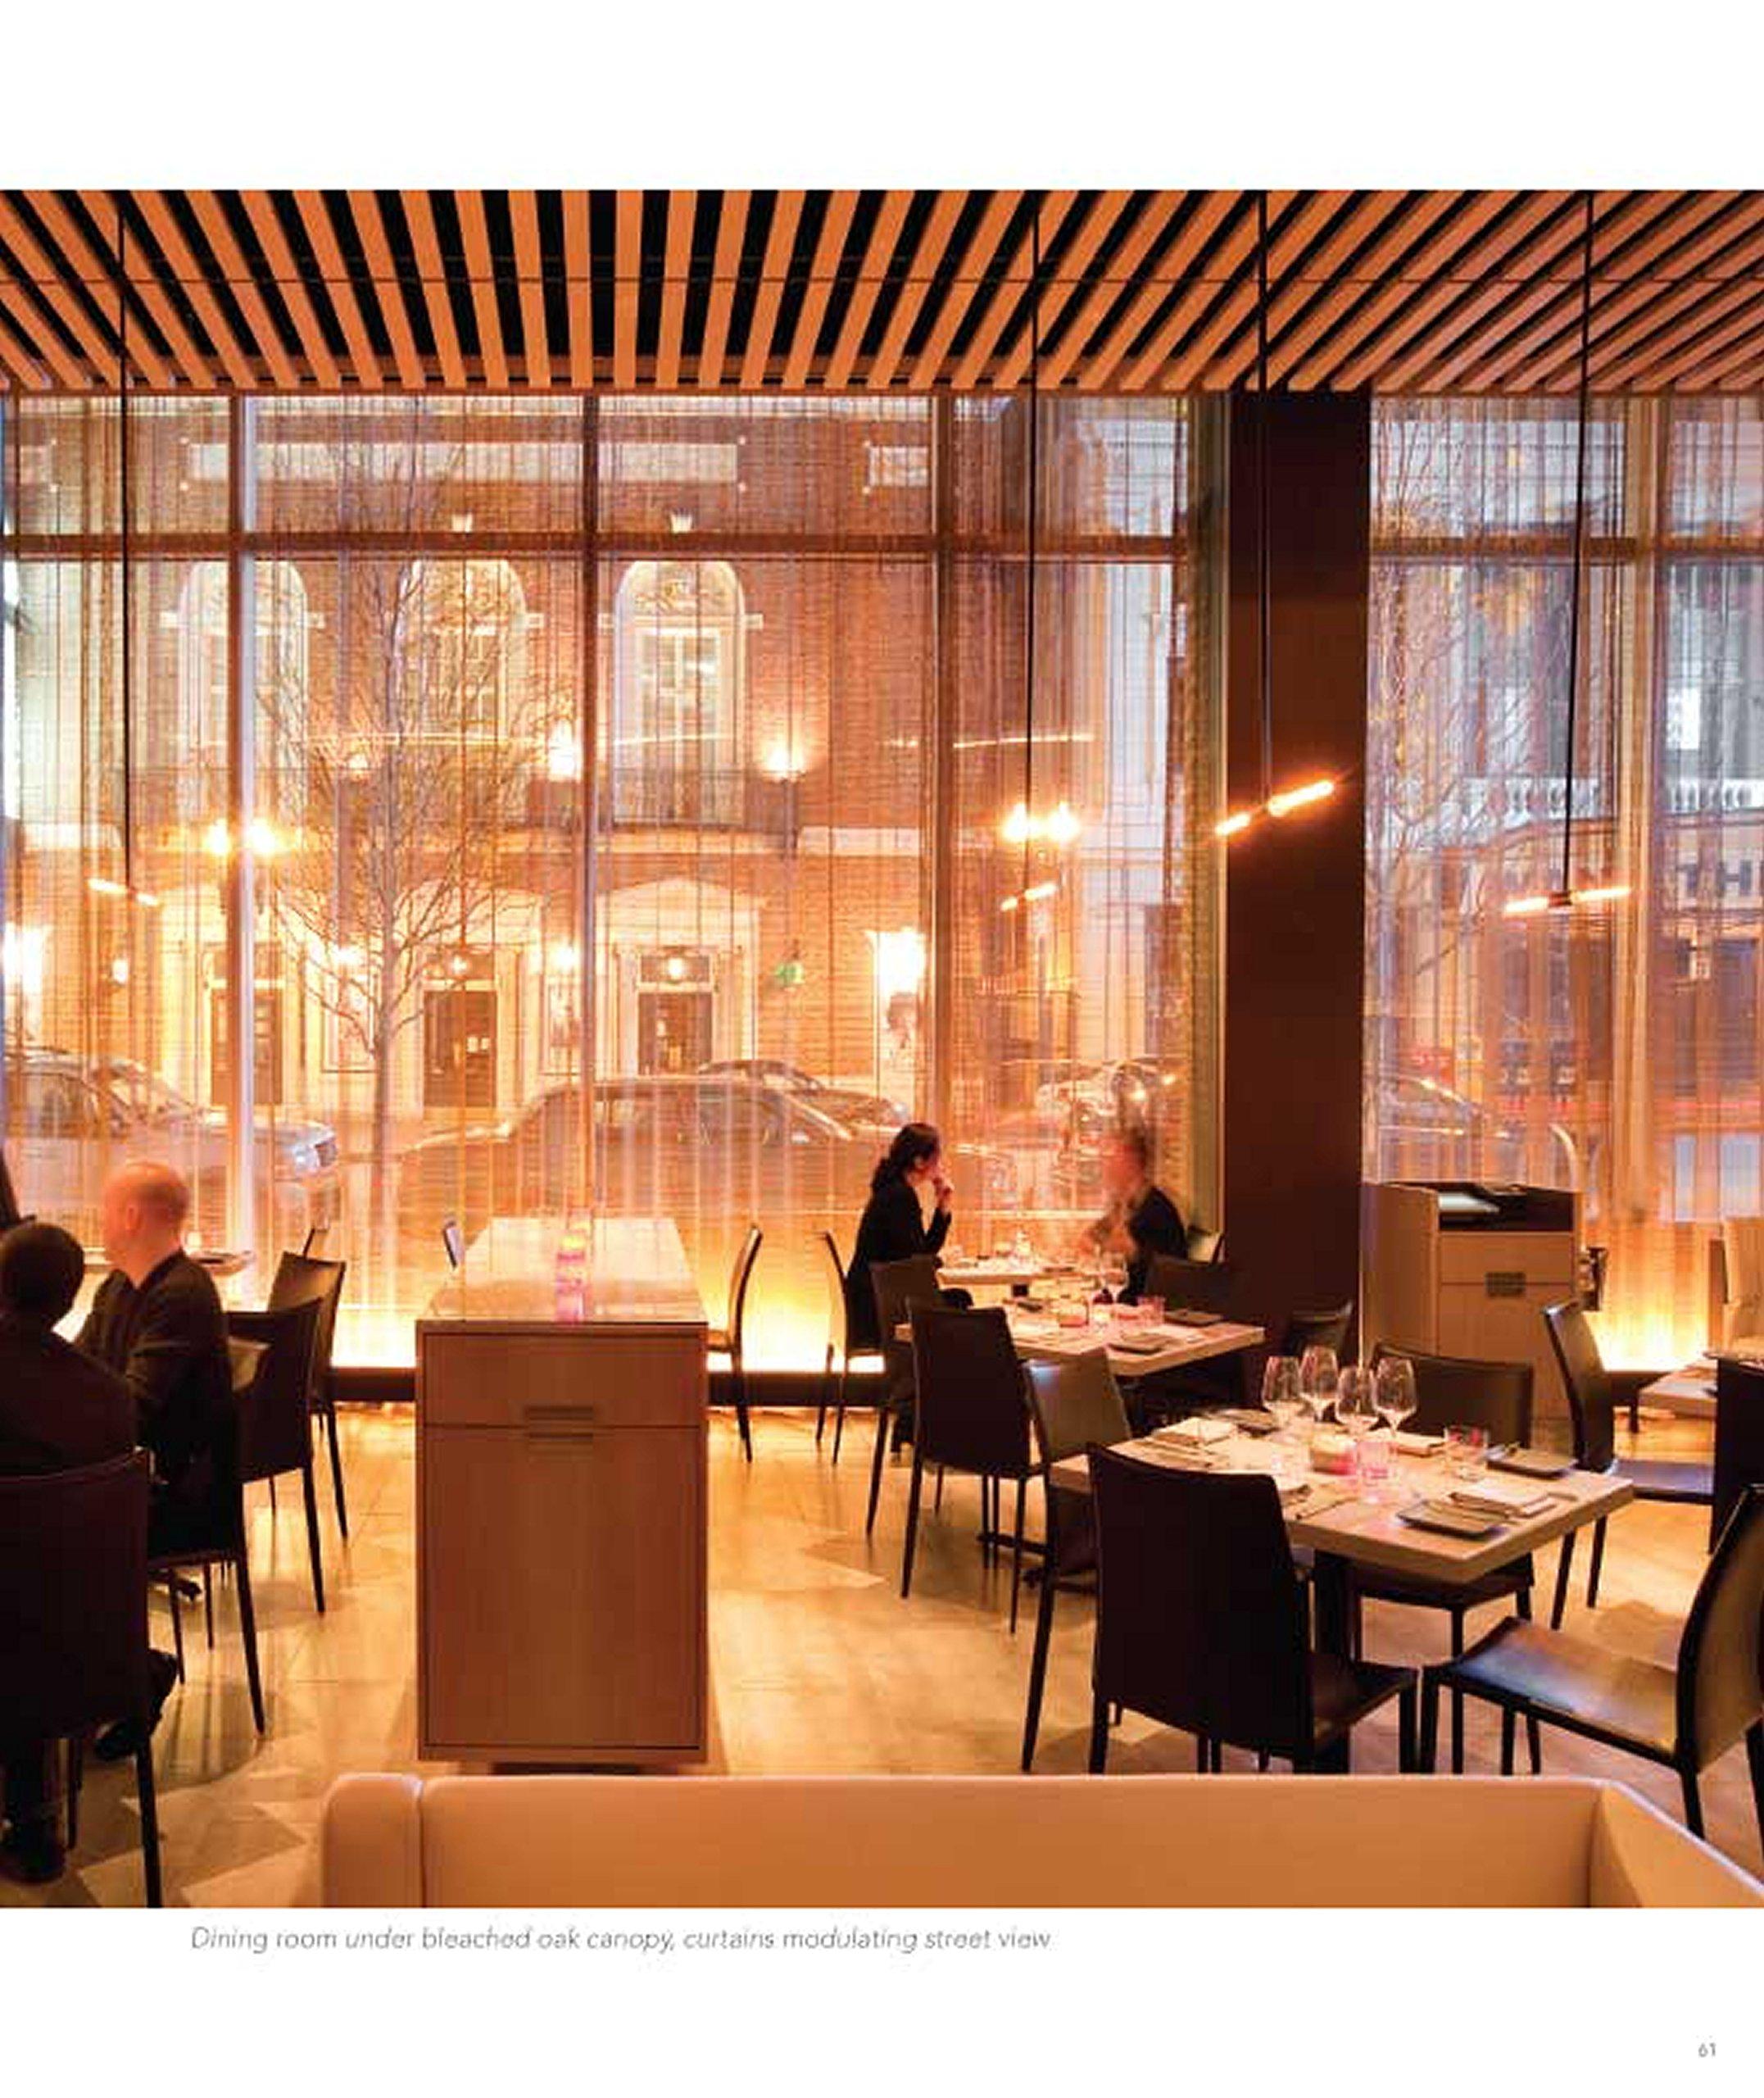 Restaurant Architecture of Bentel /& Bentel Nourishing the Senses